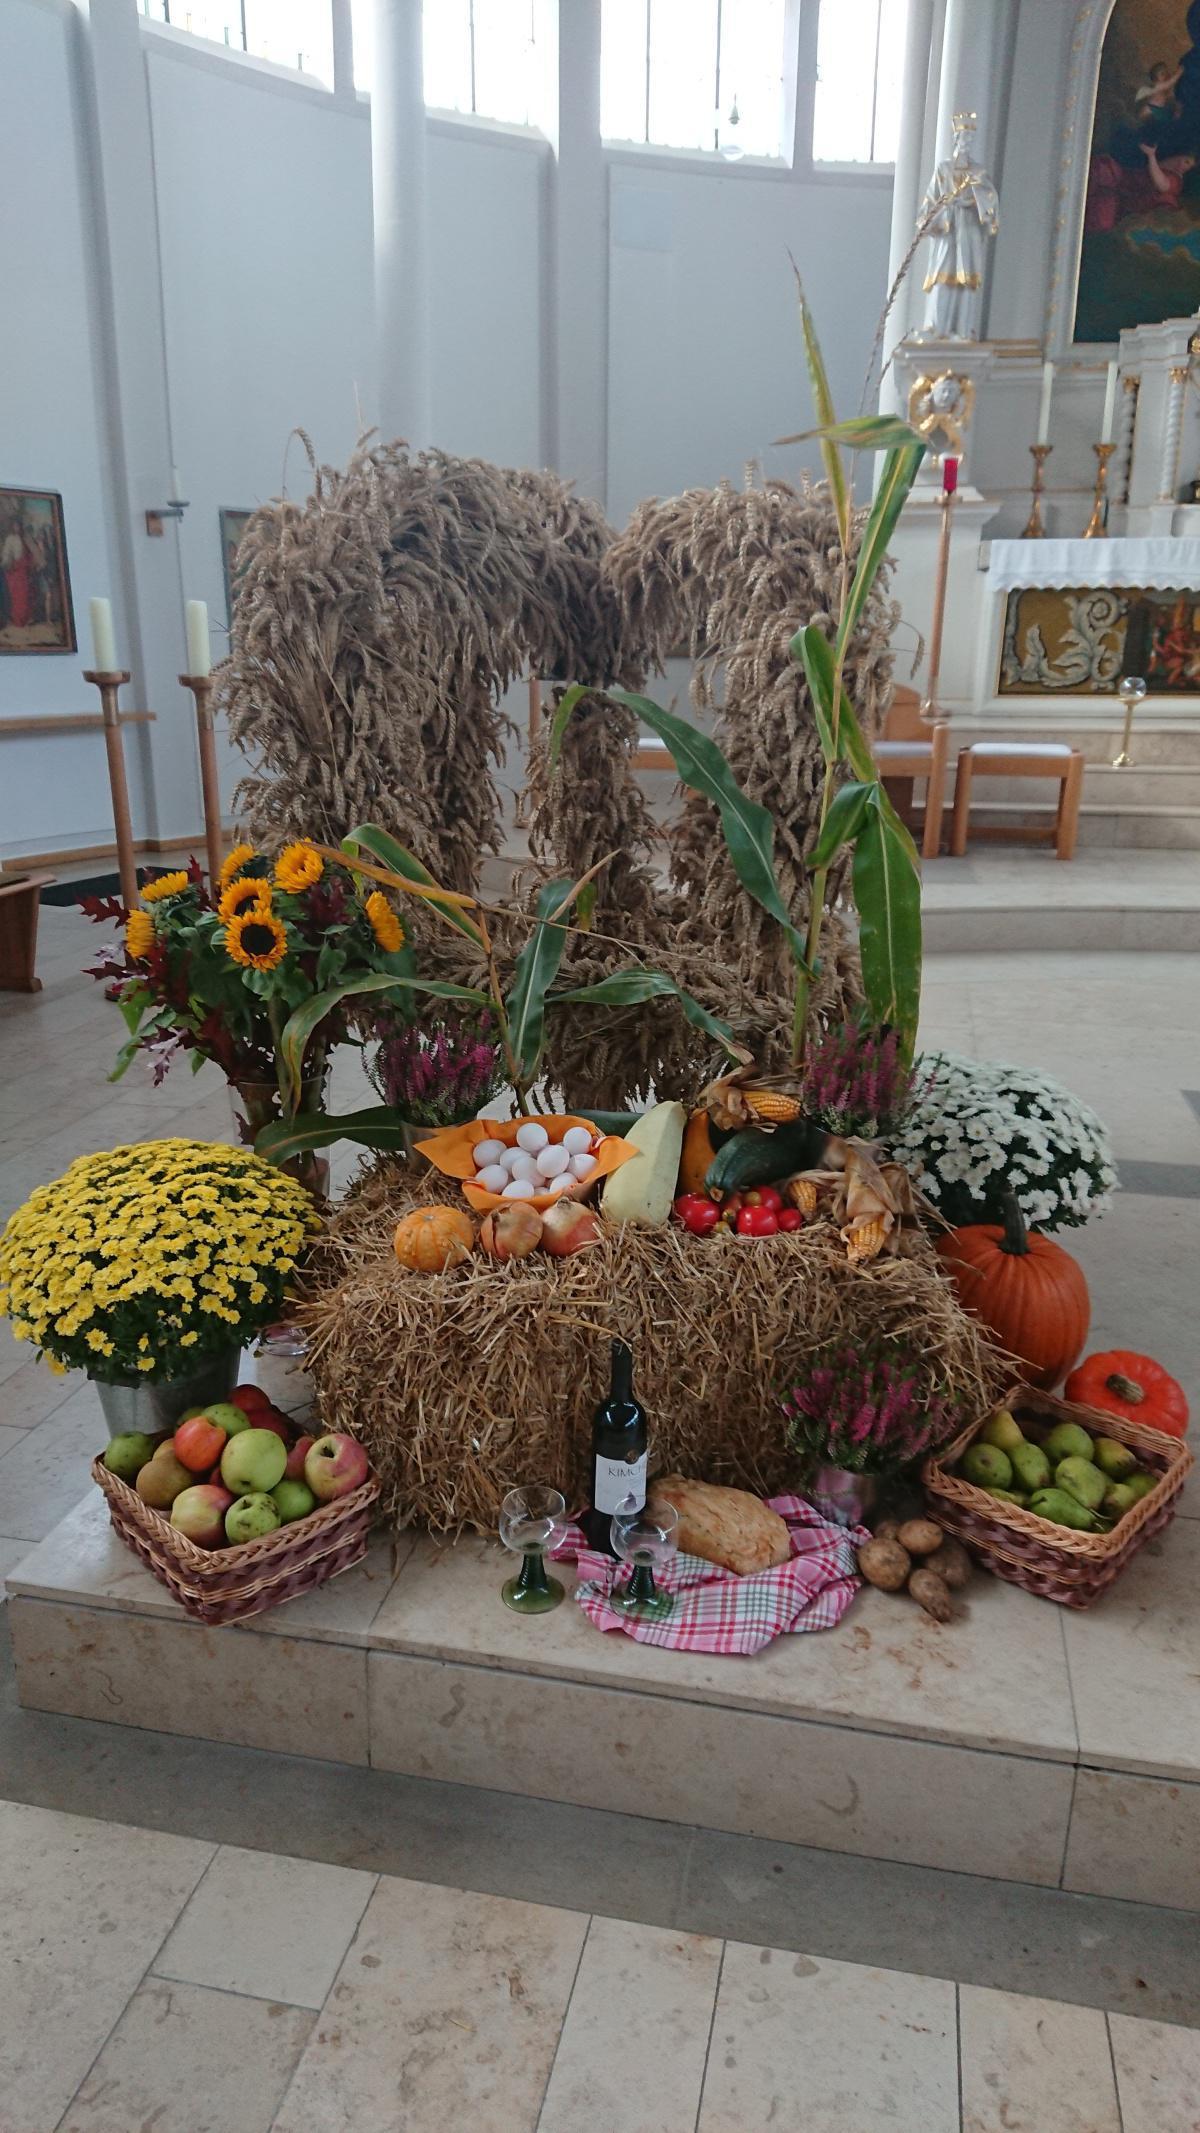 Erntedankfest in Langen